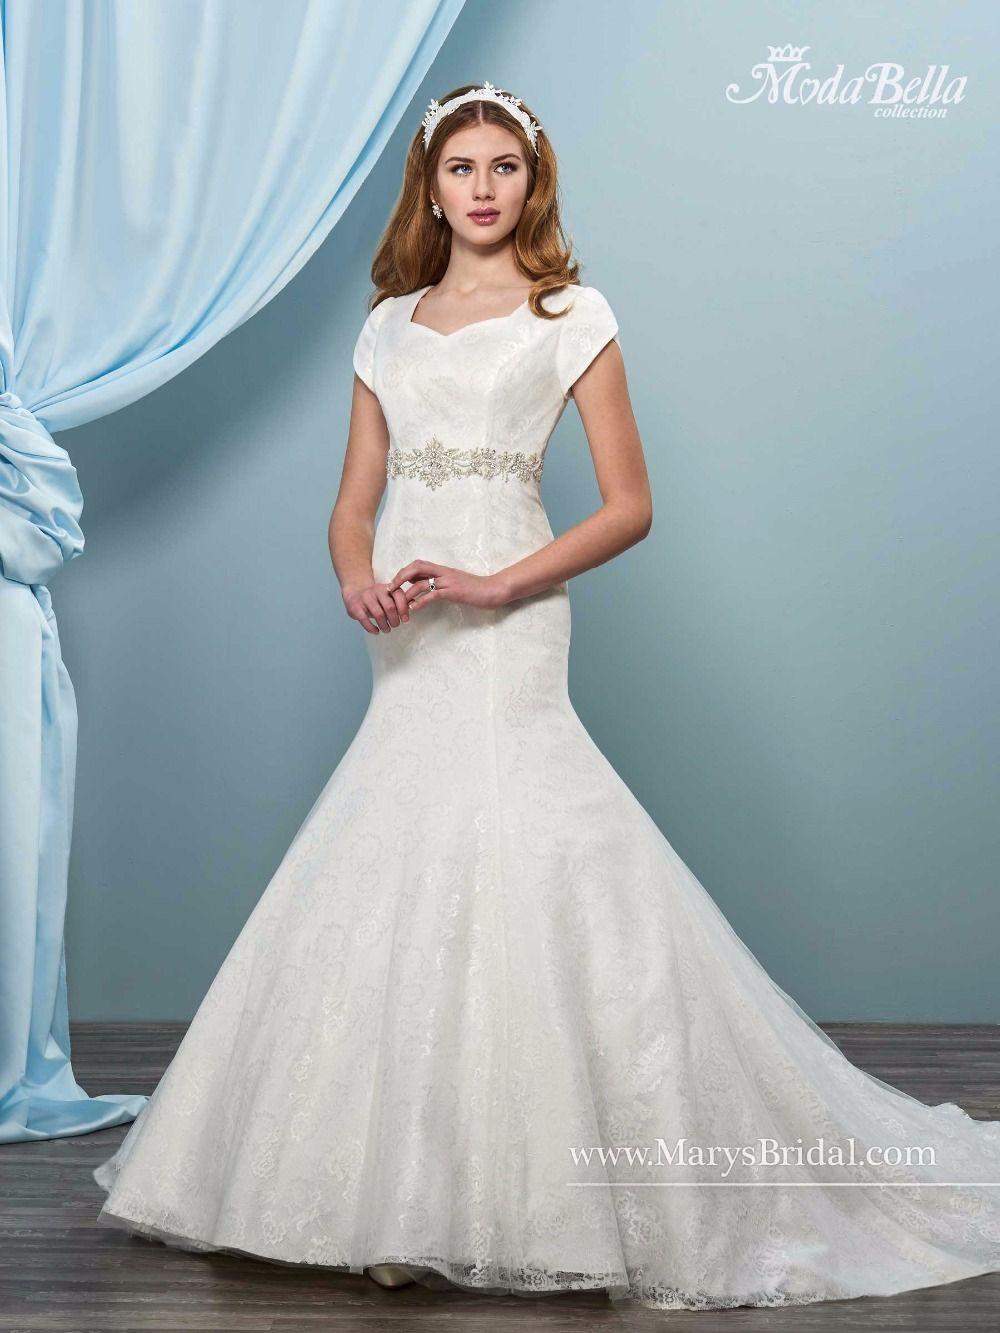 Find More Wedding Dresses Information about Vestidos De Renda ...